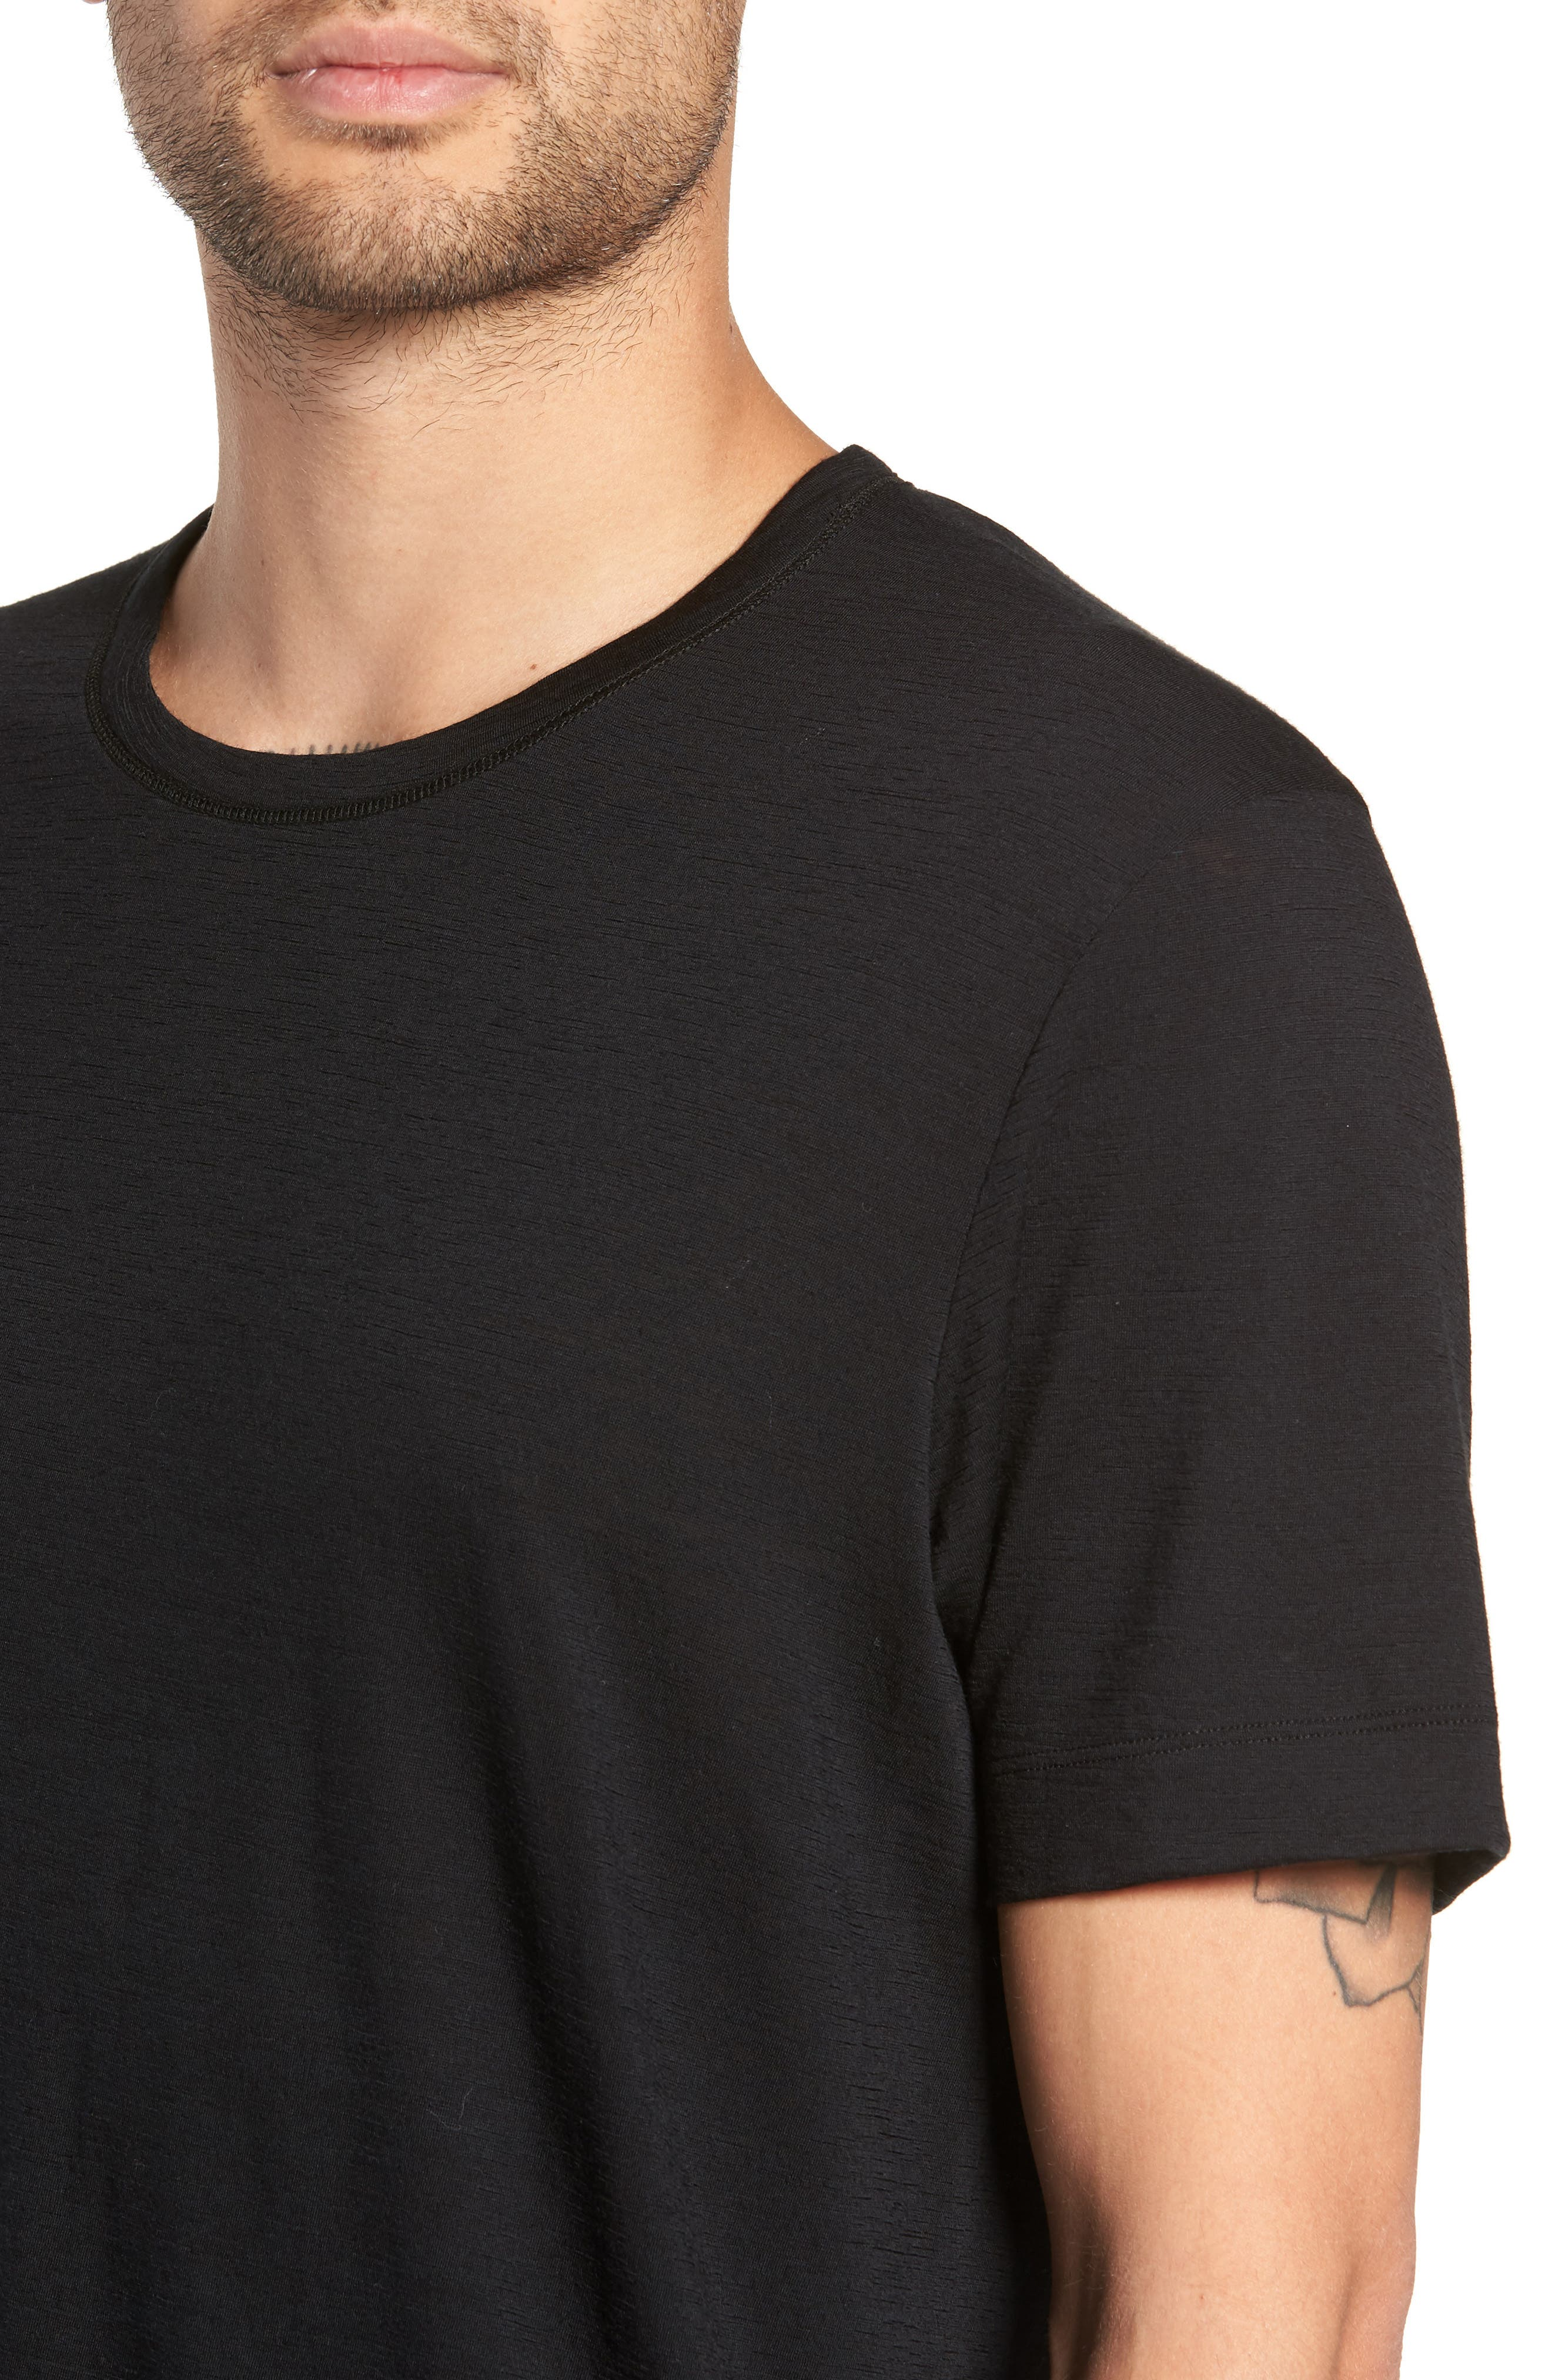 Swedish Merino Wool T-Shirt,                             Alternate thumbnail 4, color,                             BLACK